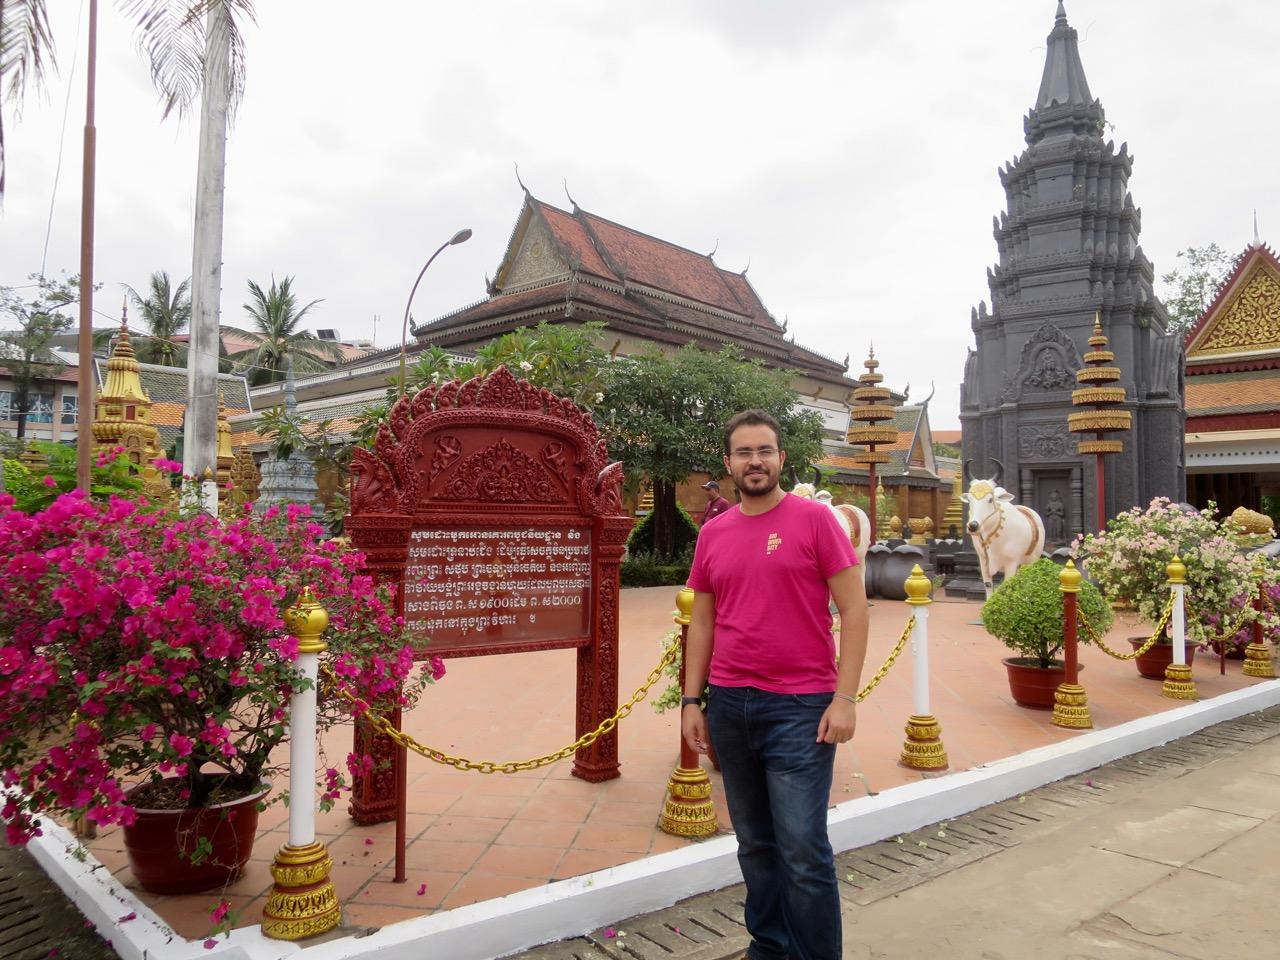 Siem Reap 1 16